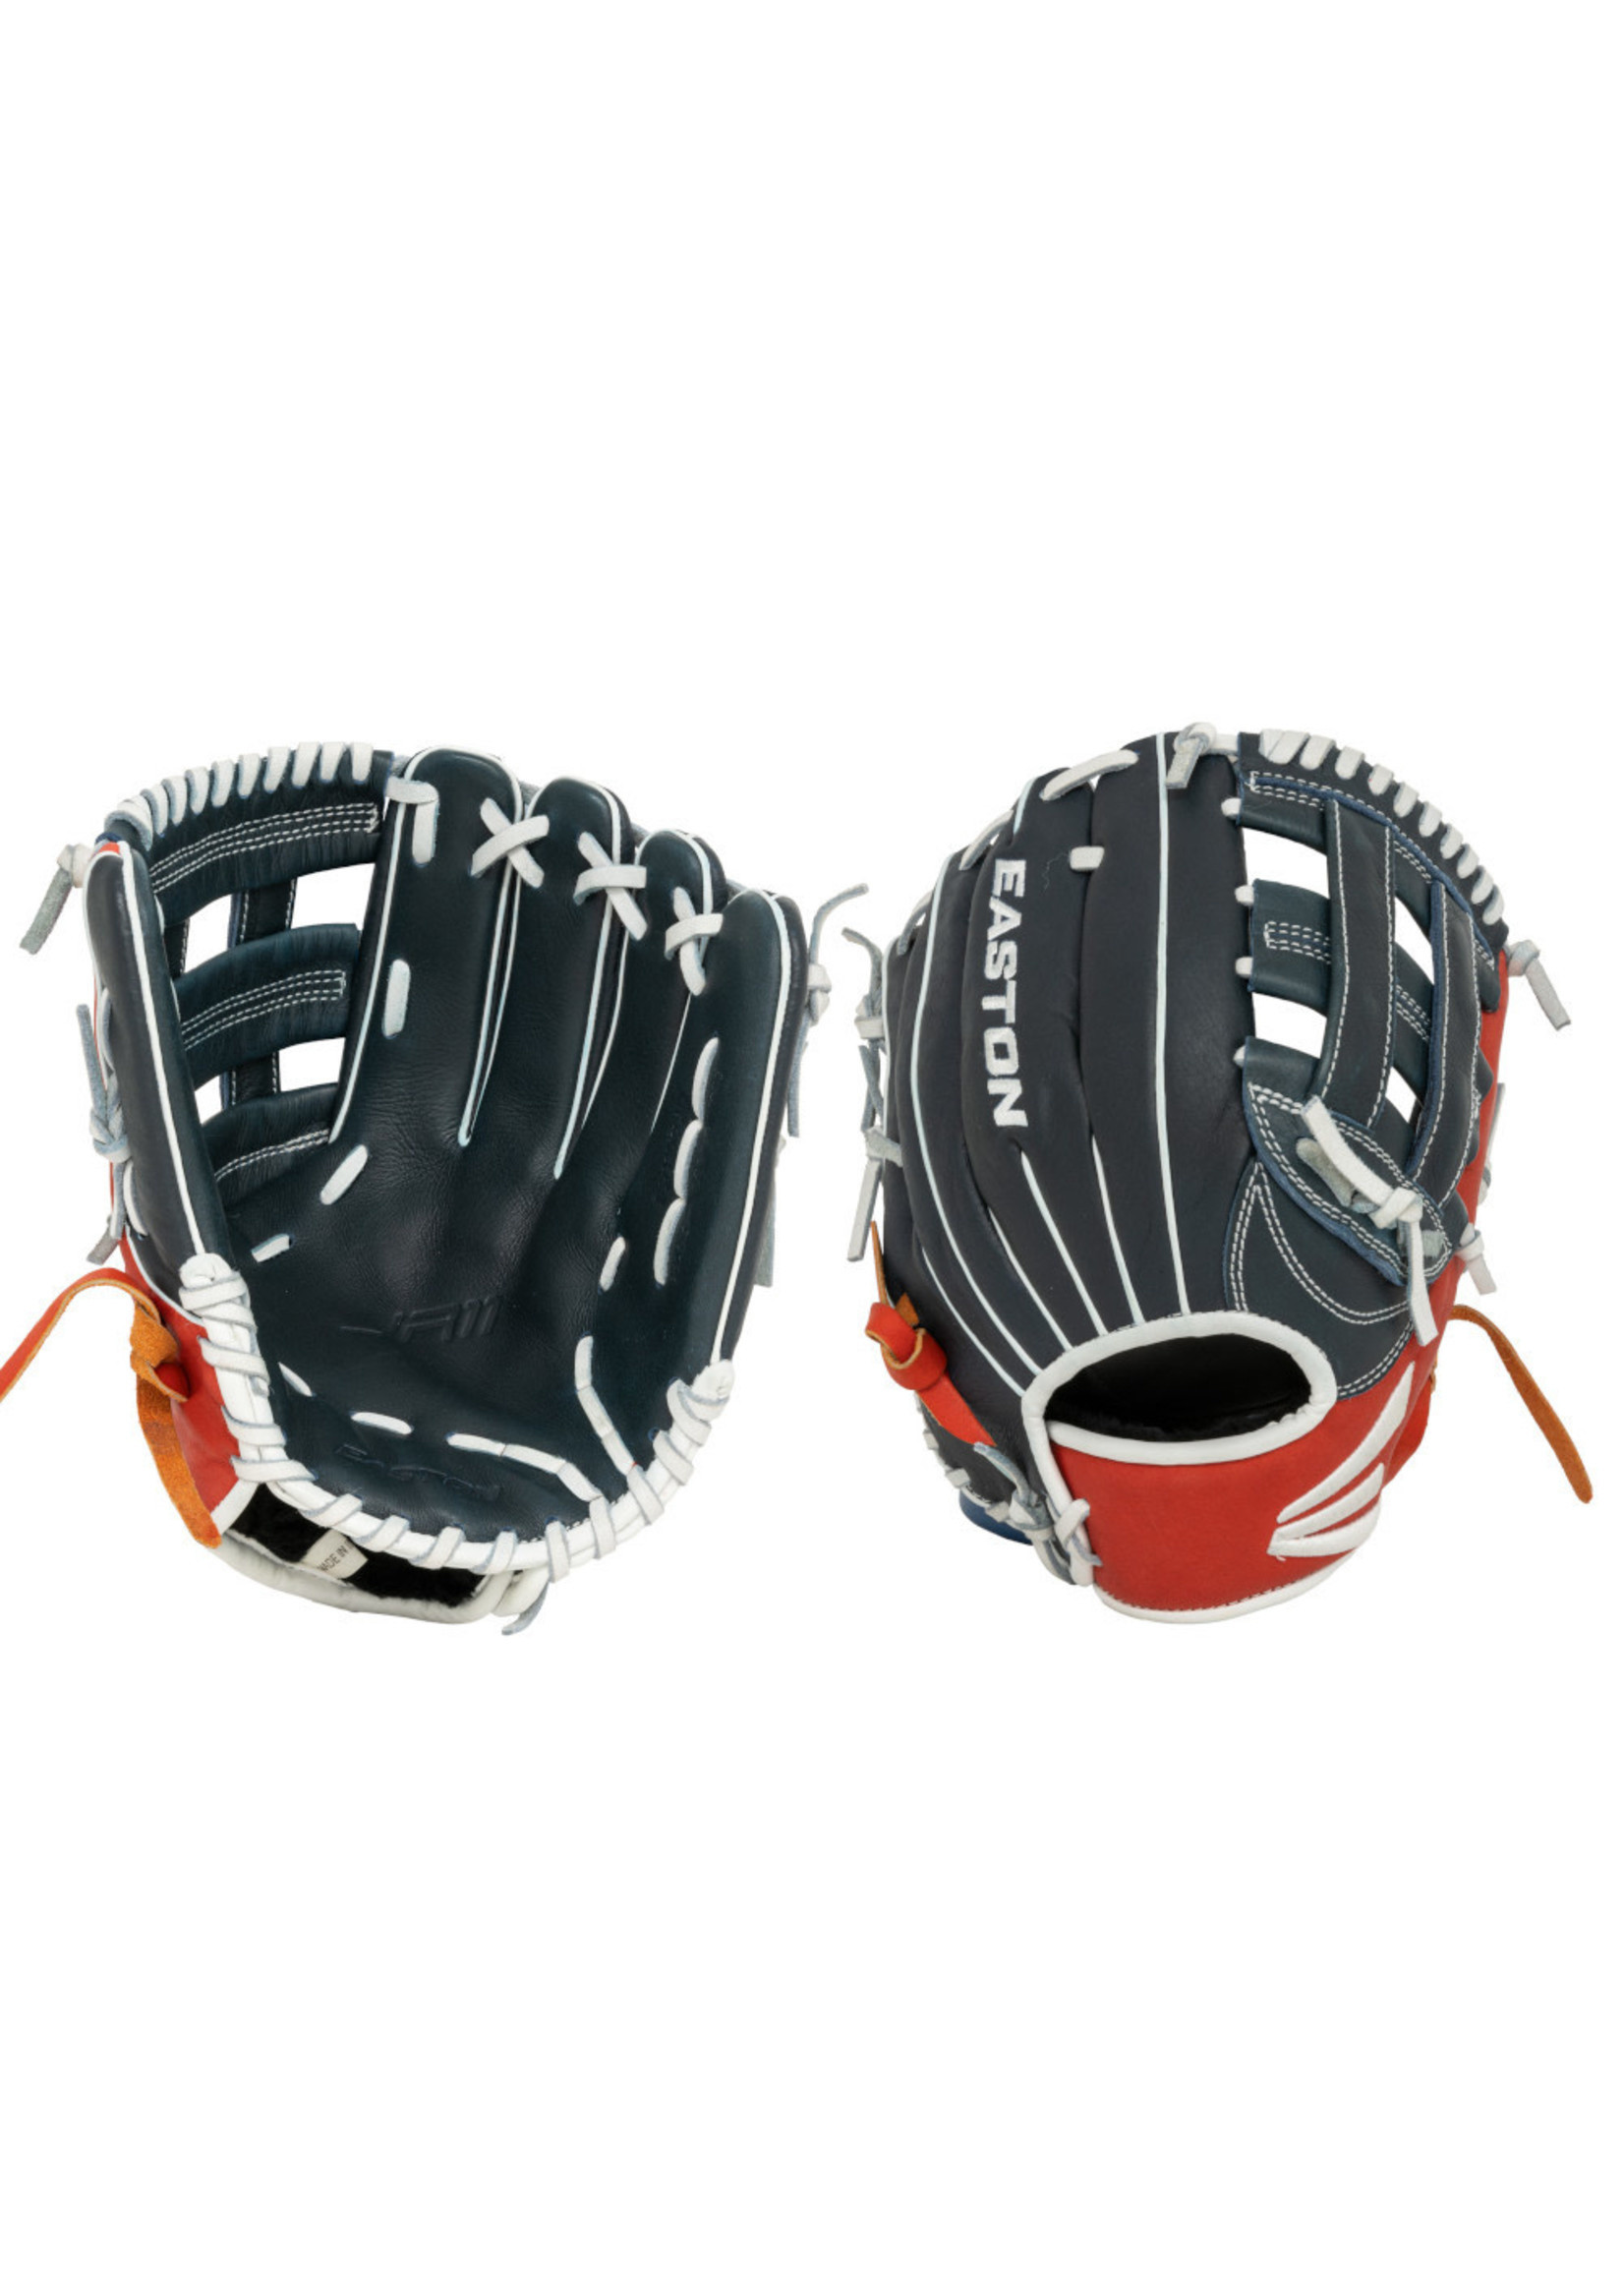 Easton Baseball (Canada) EASTON FUT PRO FP1100JR RAMIREZ 11.50'' BASEBALL GLOVE